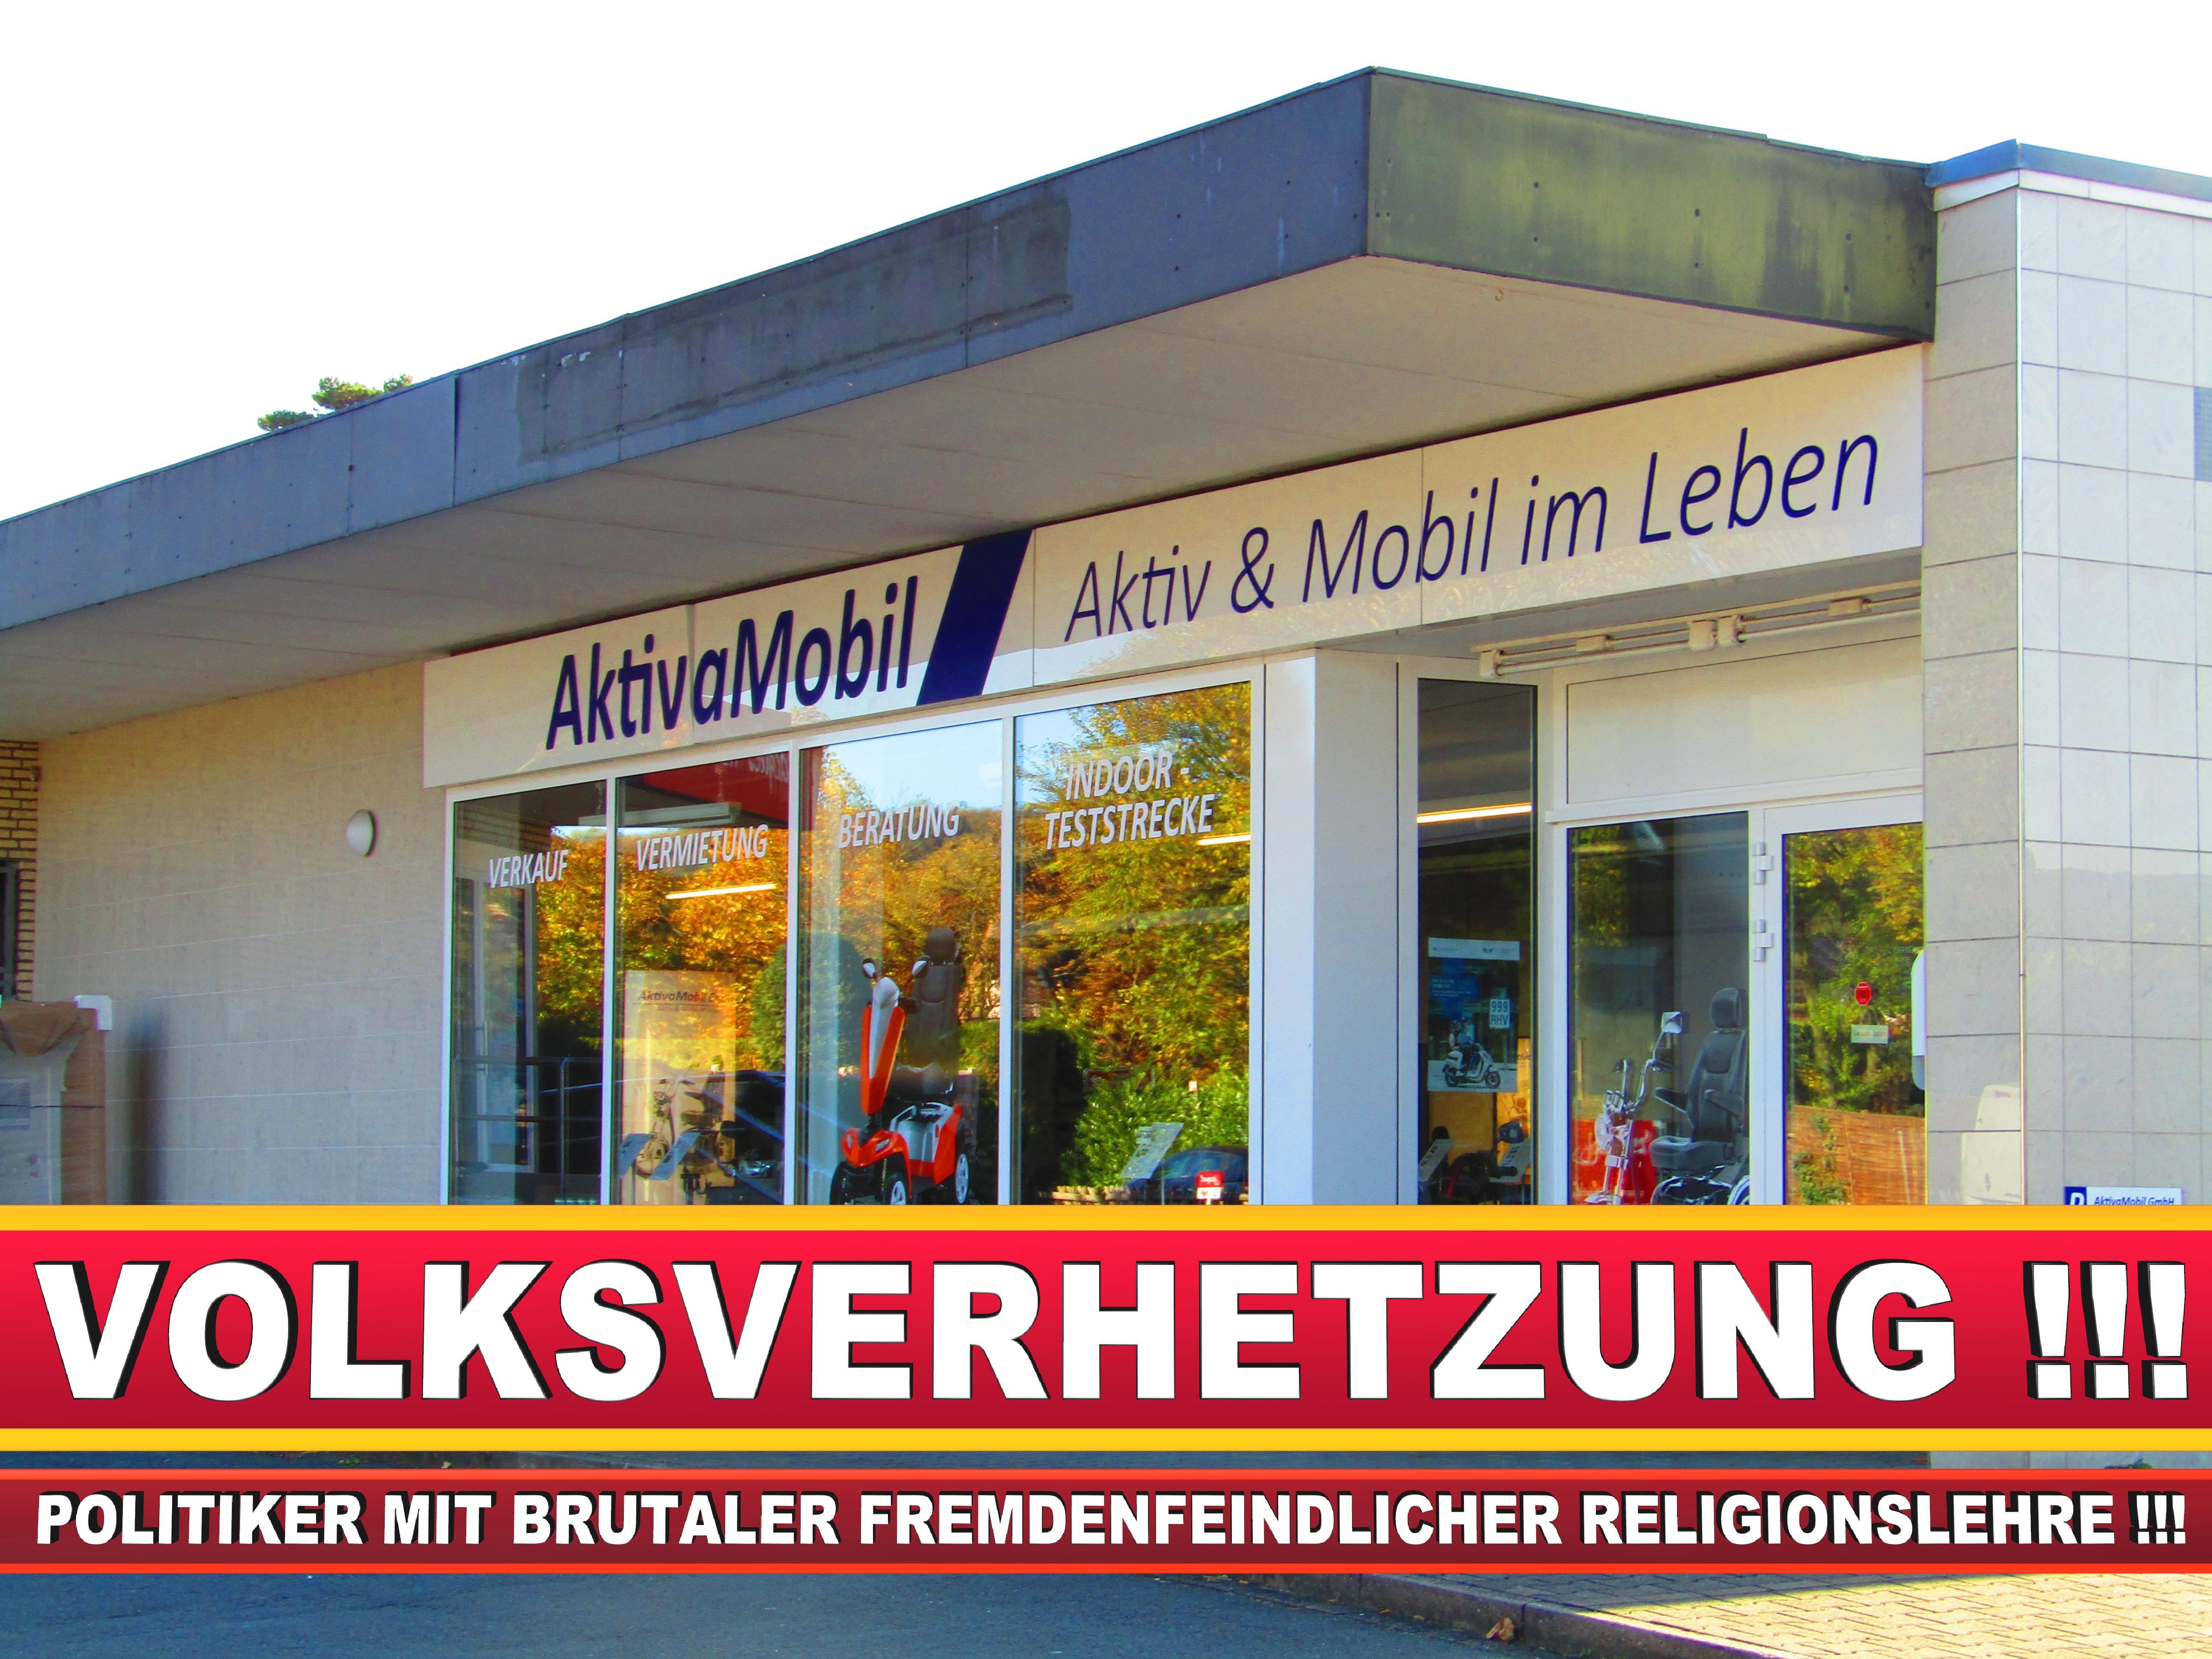 Aktiva Mobil Bielefeld Badener Str 1 CDU Bielefeld Aktivamobil GmbH (2)